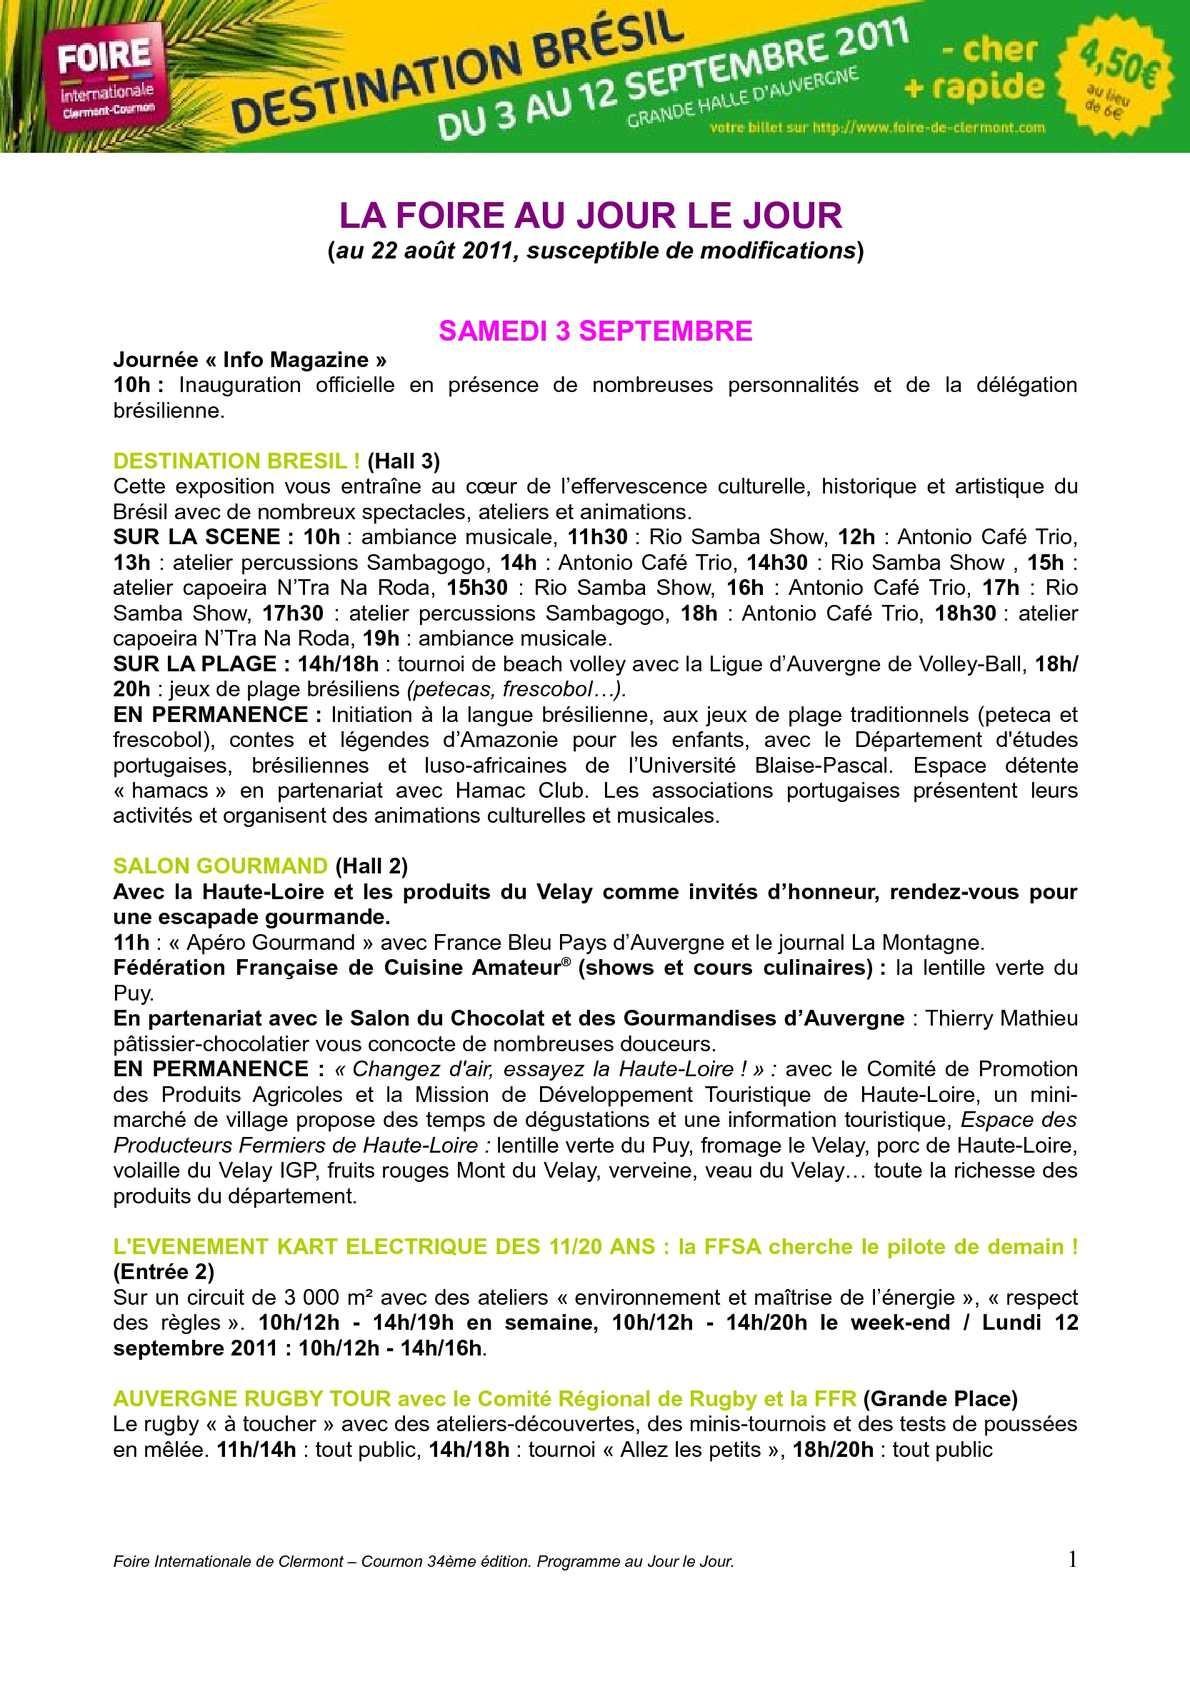 Calam o programme foire internationale de clermont for Foire internationale de clermont cournon